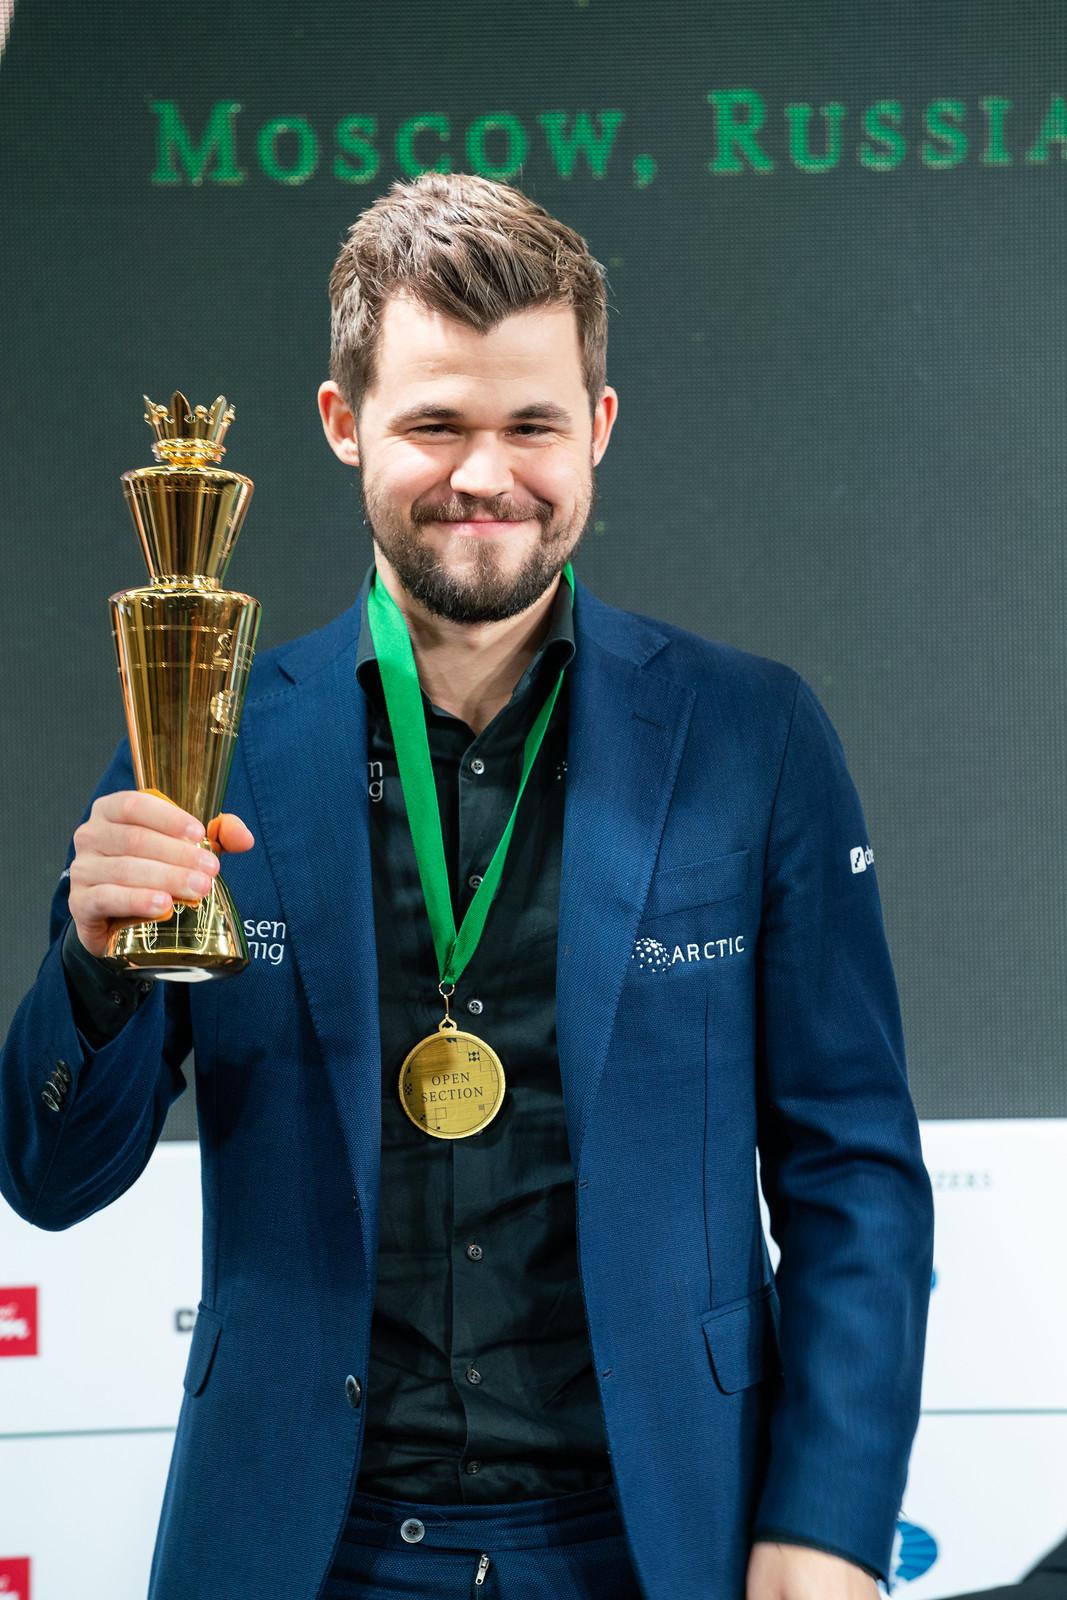 Mondiale_Rapid_blitz_2019_premiazione_carlsen_trofeo